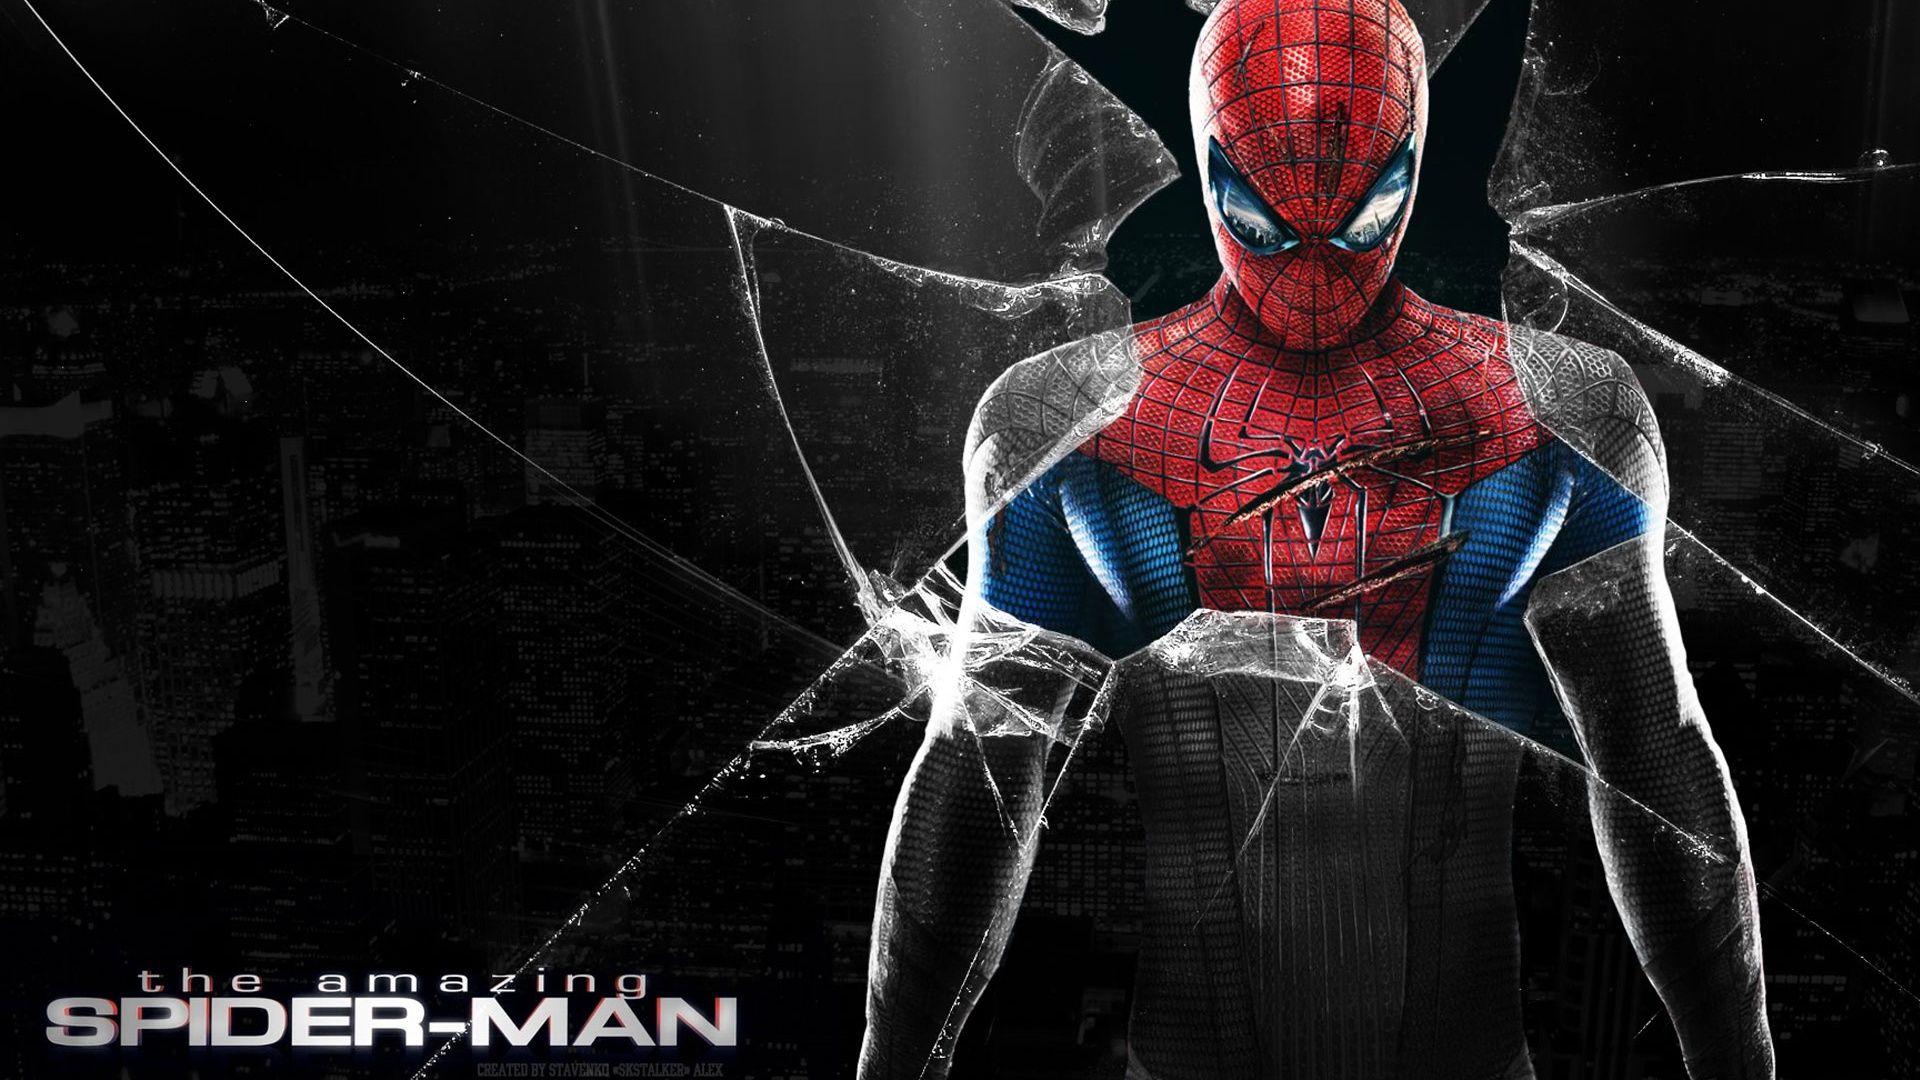 The Amazing Spider Man Full Movie 2012 HD http//movie70